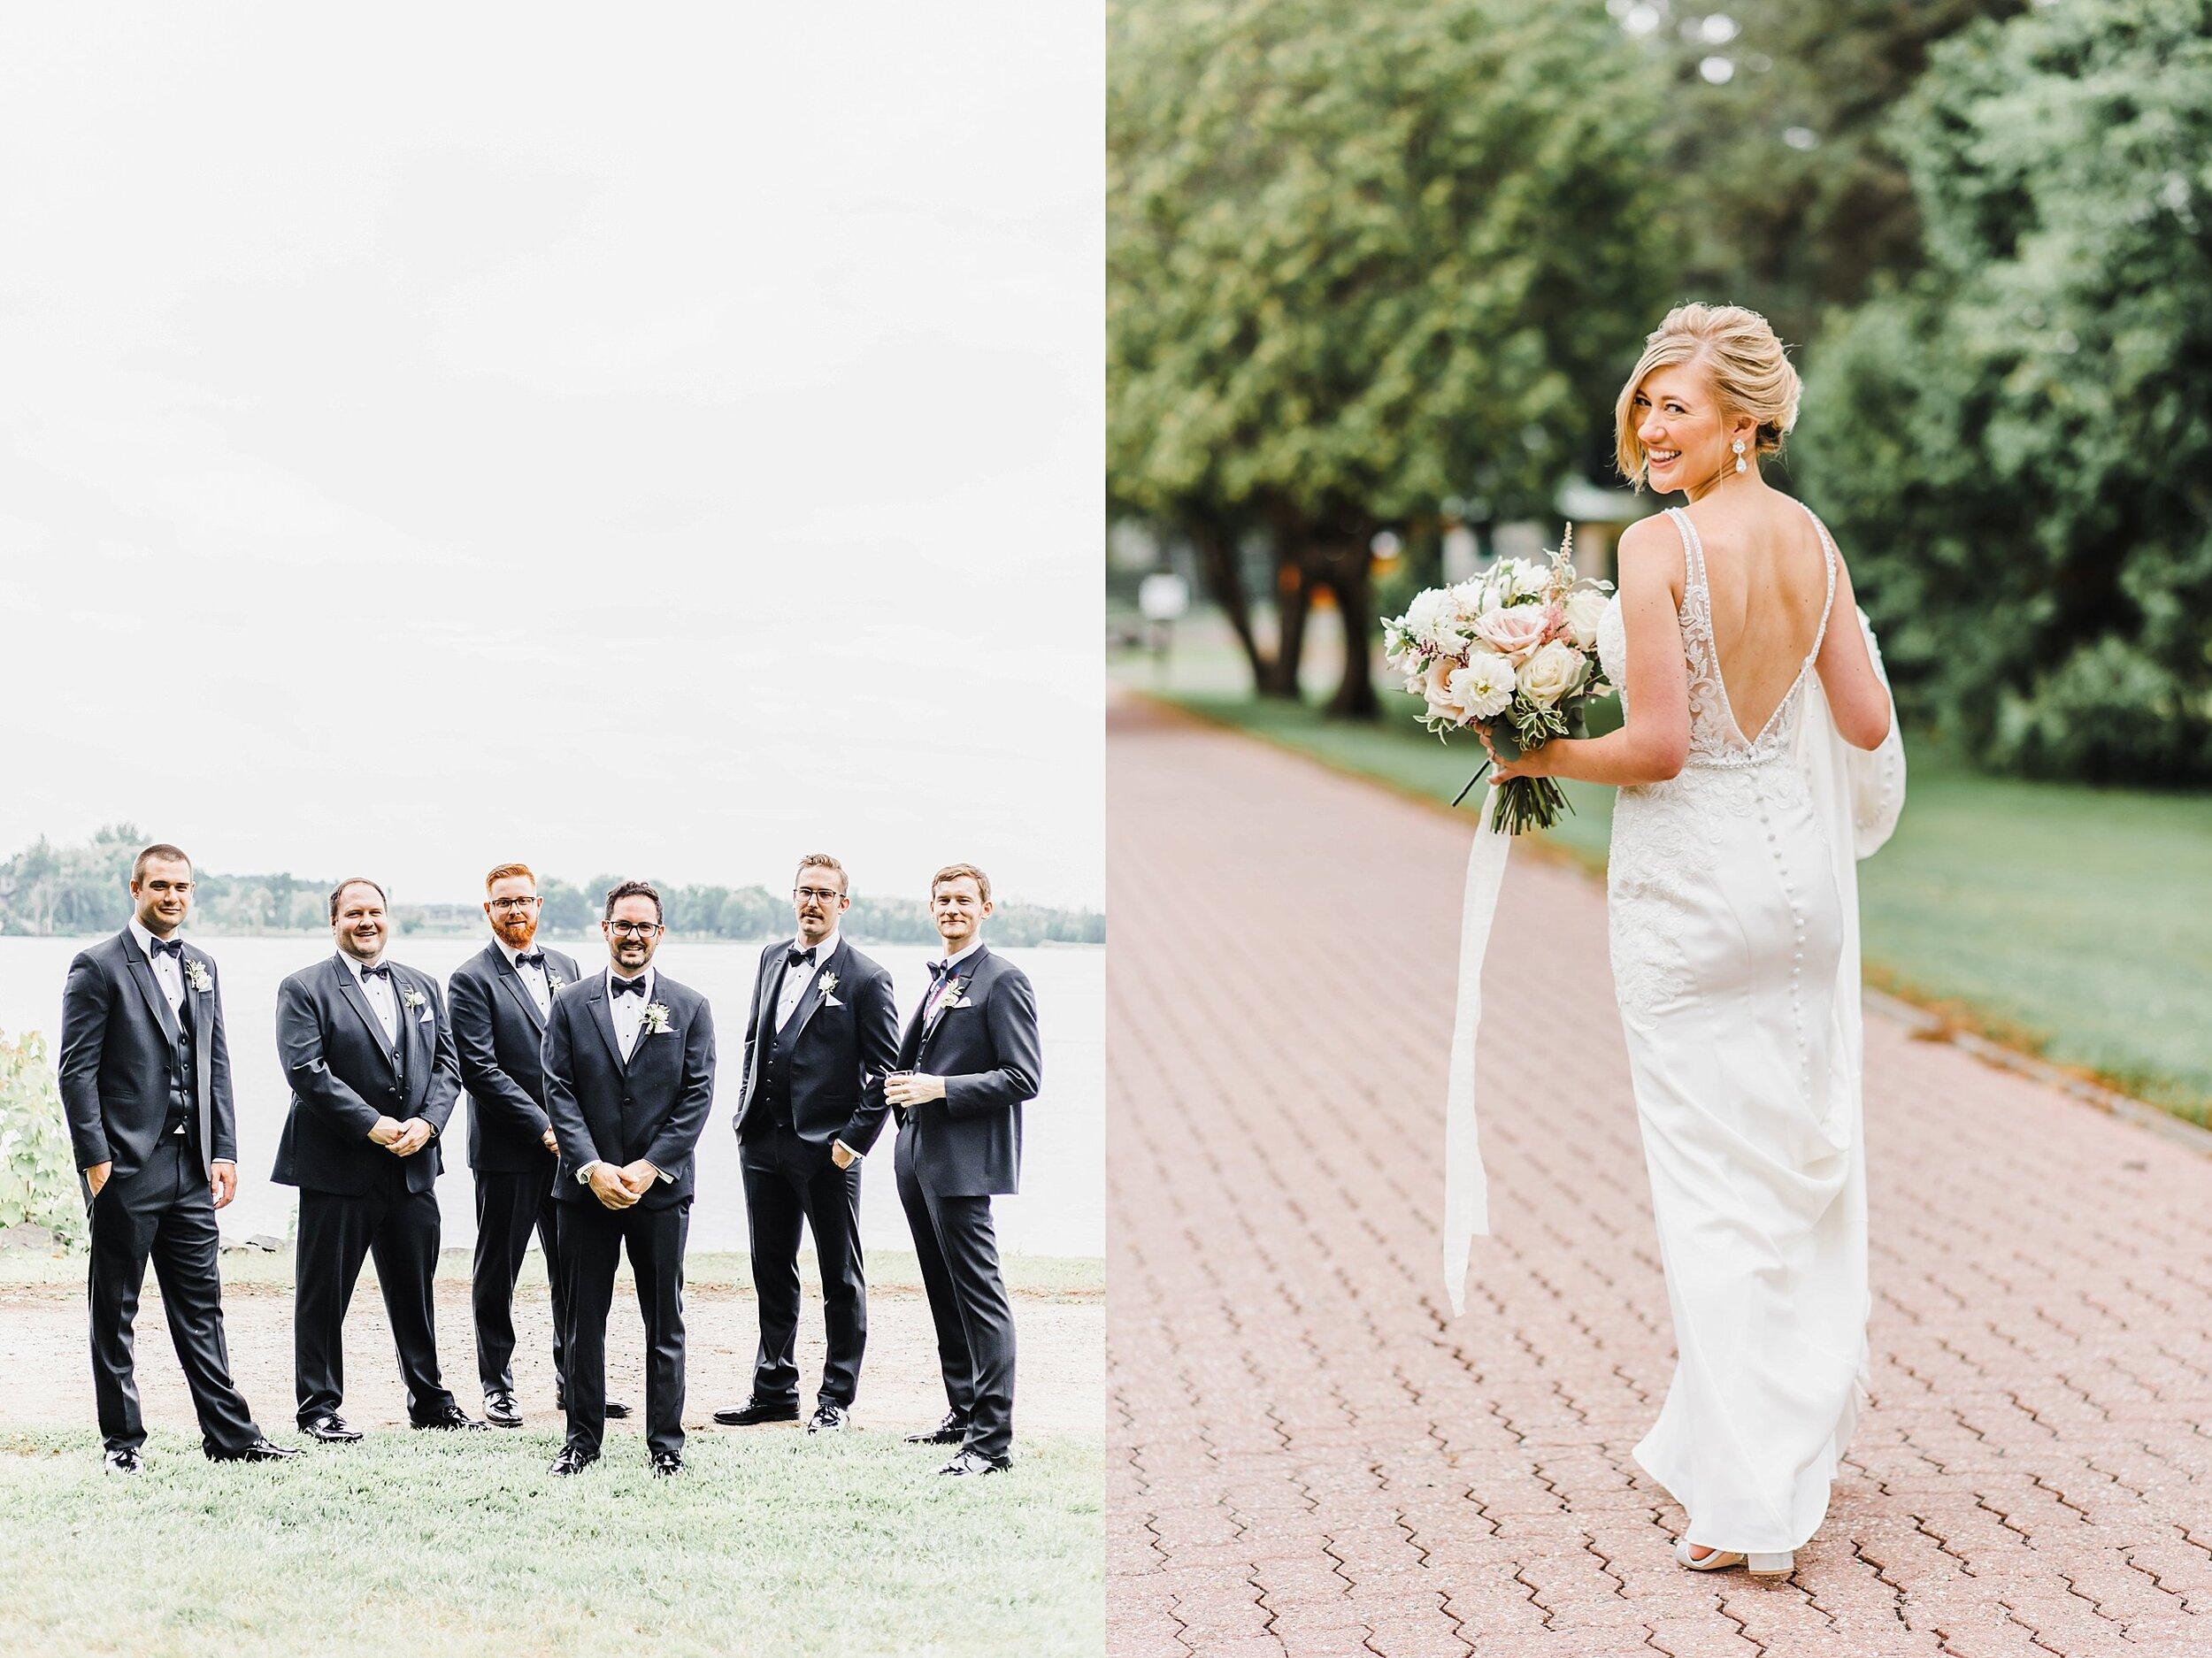 light airy fine art ottawa wedding photographer | Ali and Batoul Photography | Fairmont Le Chateau Montebello26.jpg